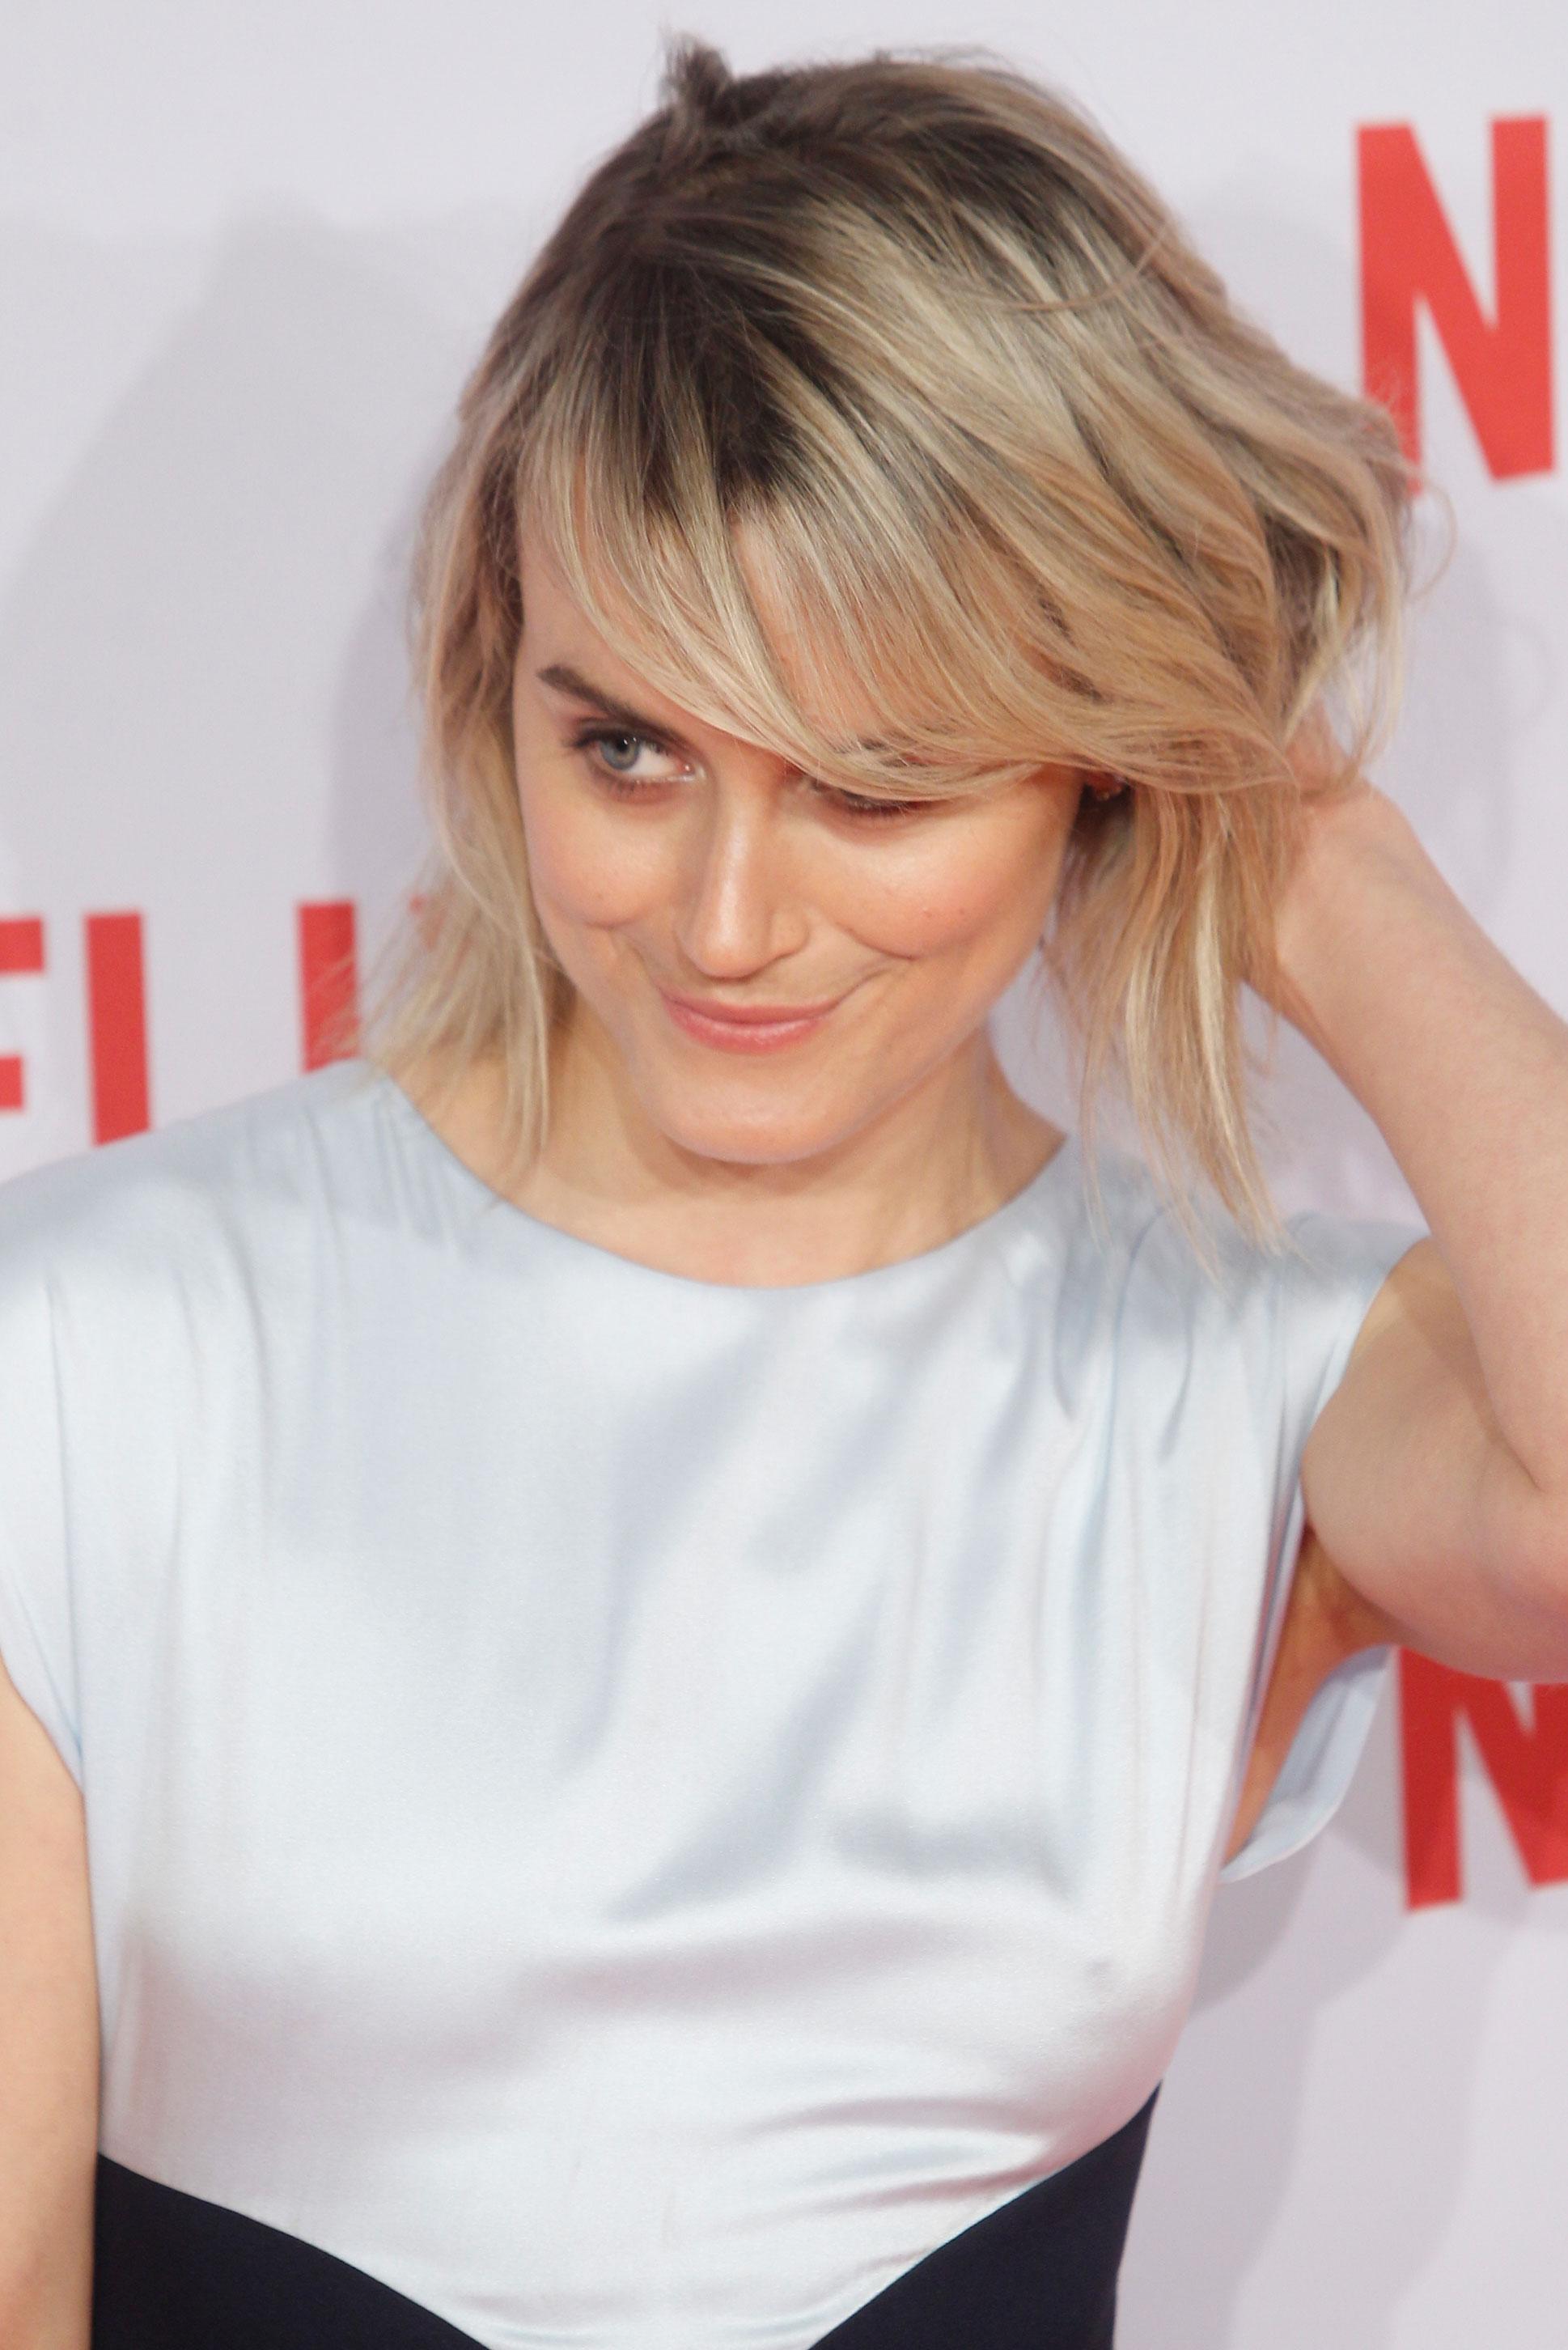 Taylor Schilling Netflix Spain Presentation 1